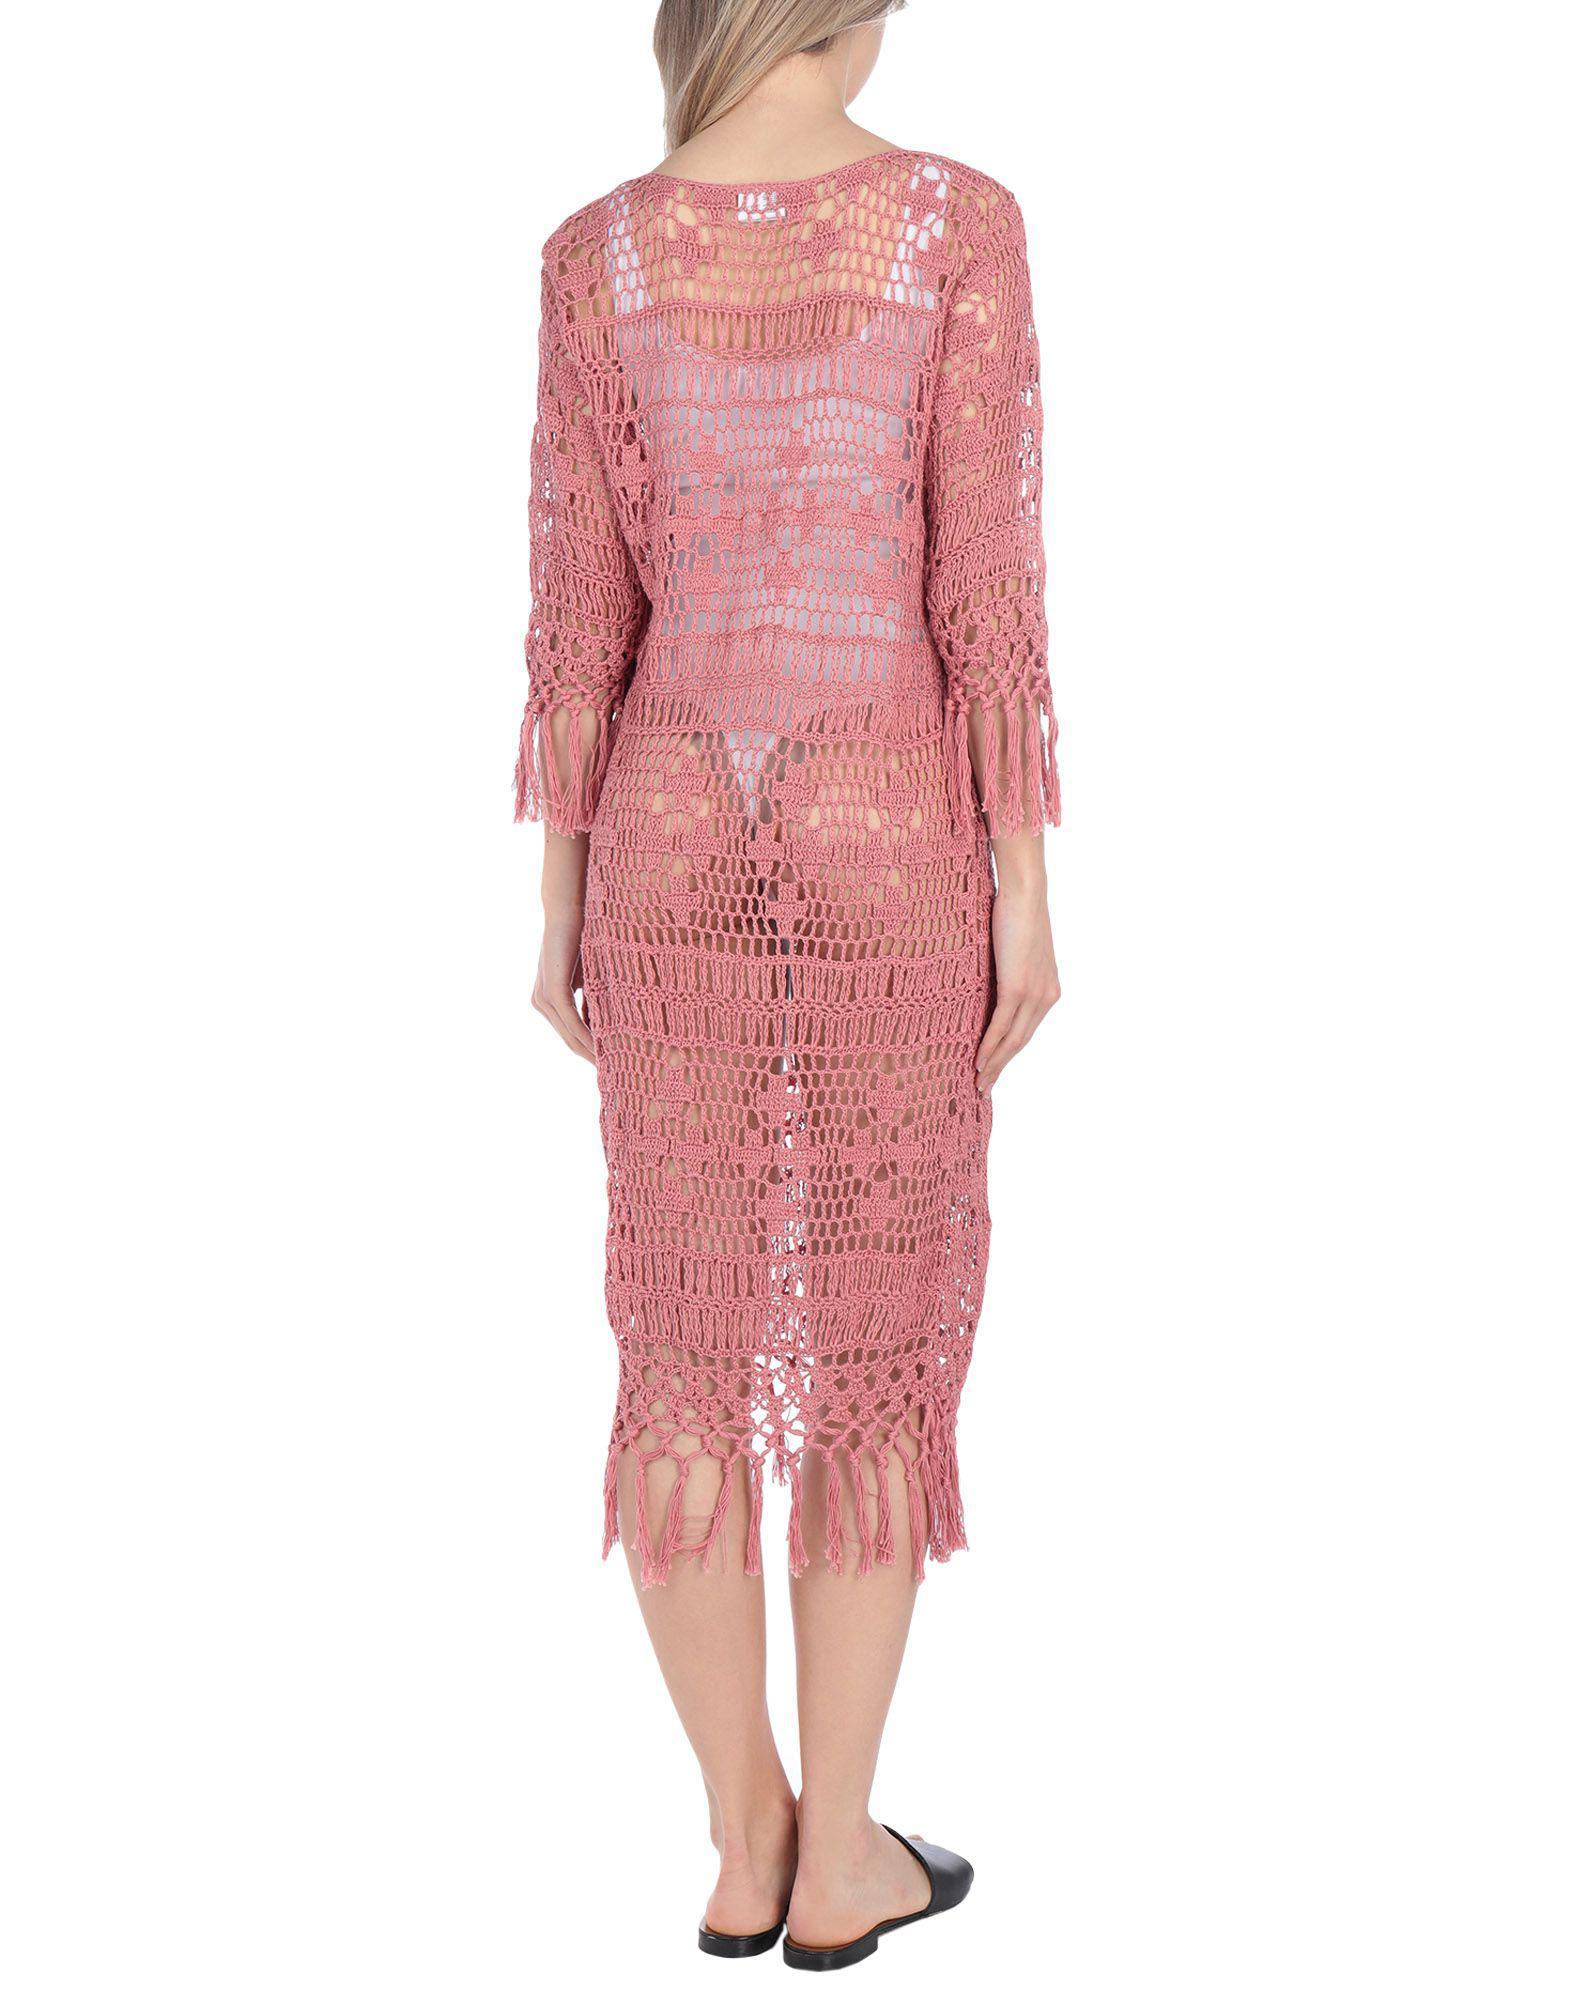 56acda09fbb9e Anna Kosturova Cover-up in Pink - Lyst